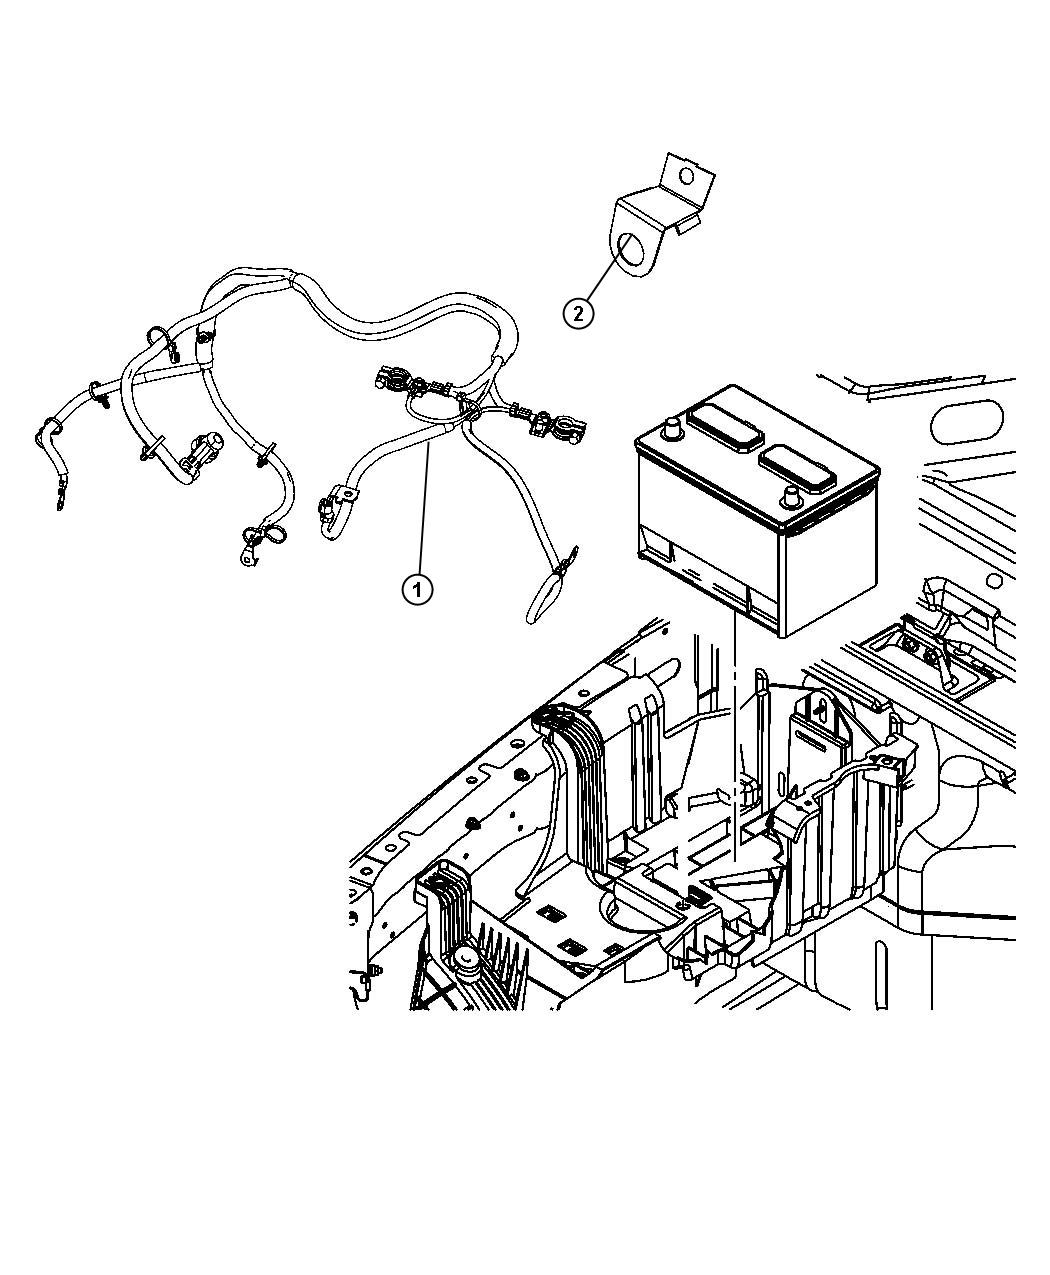 tags: #replace regulator 1974 vw beetle#1978 vw beetle voltage  regulator#race engine voltage regulator ground 3#car voltage regulator#vw  bosch parts#huco